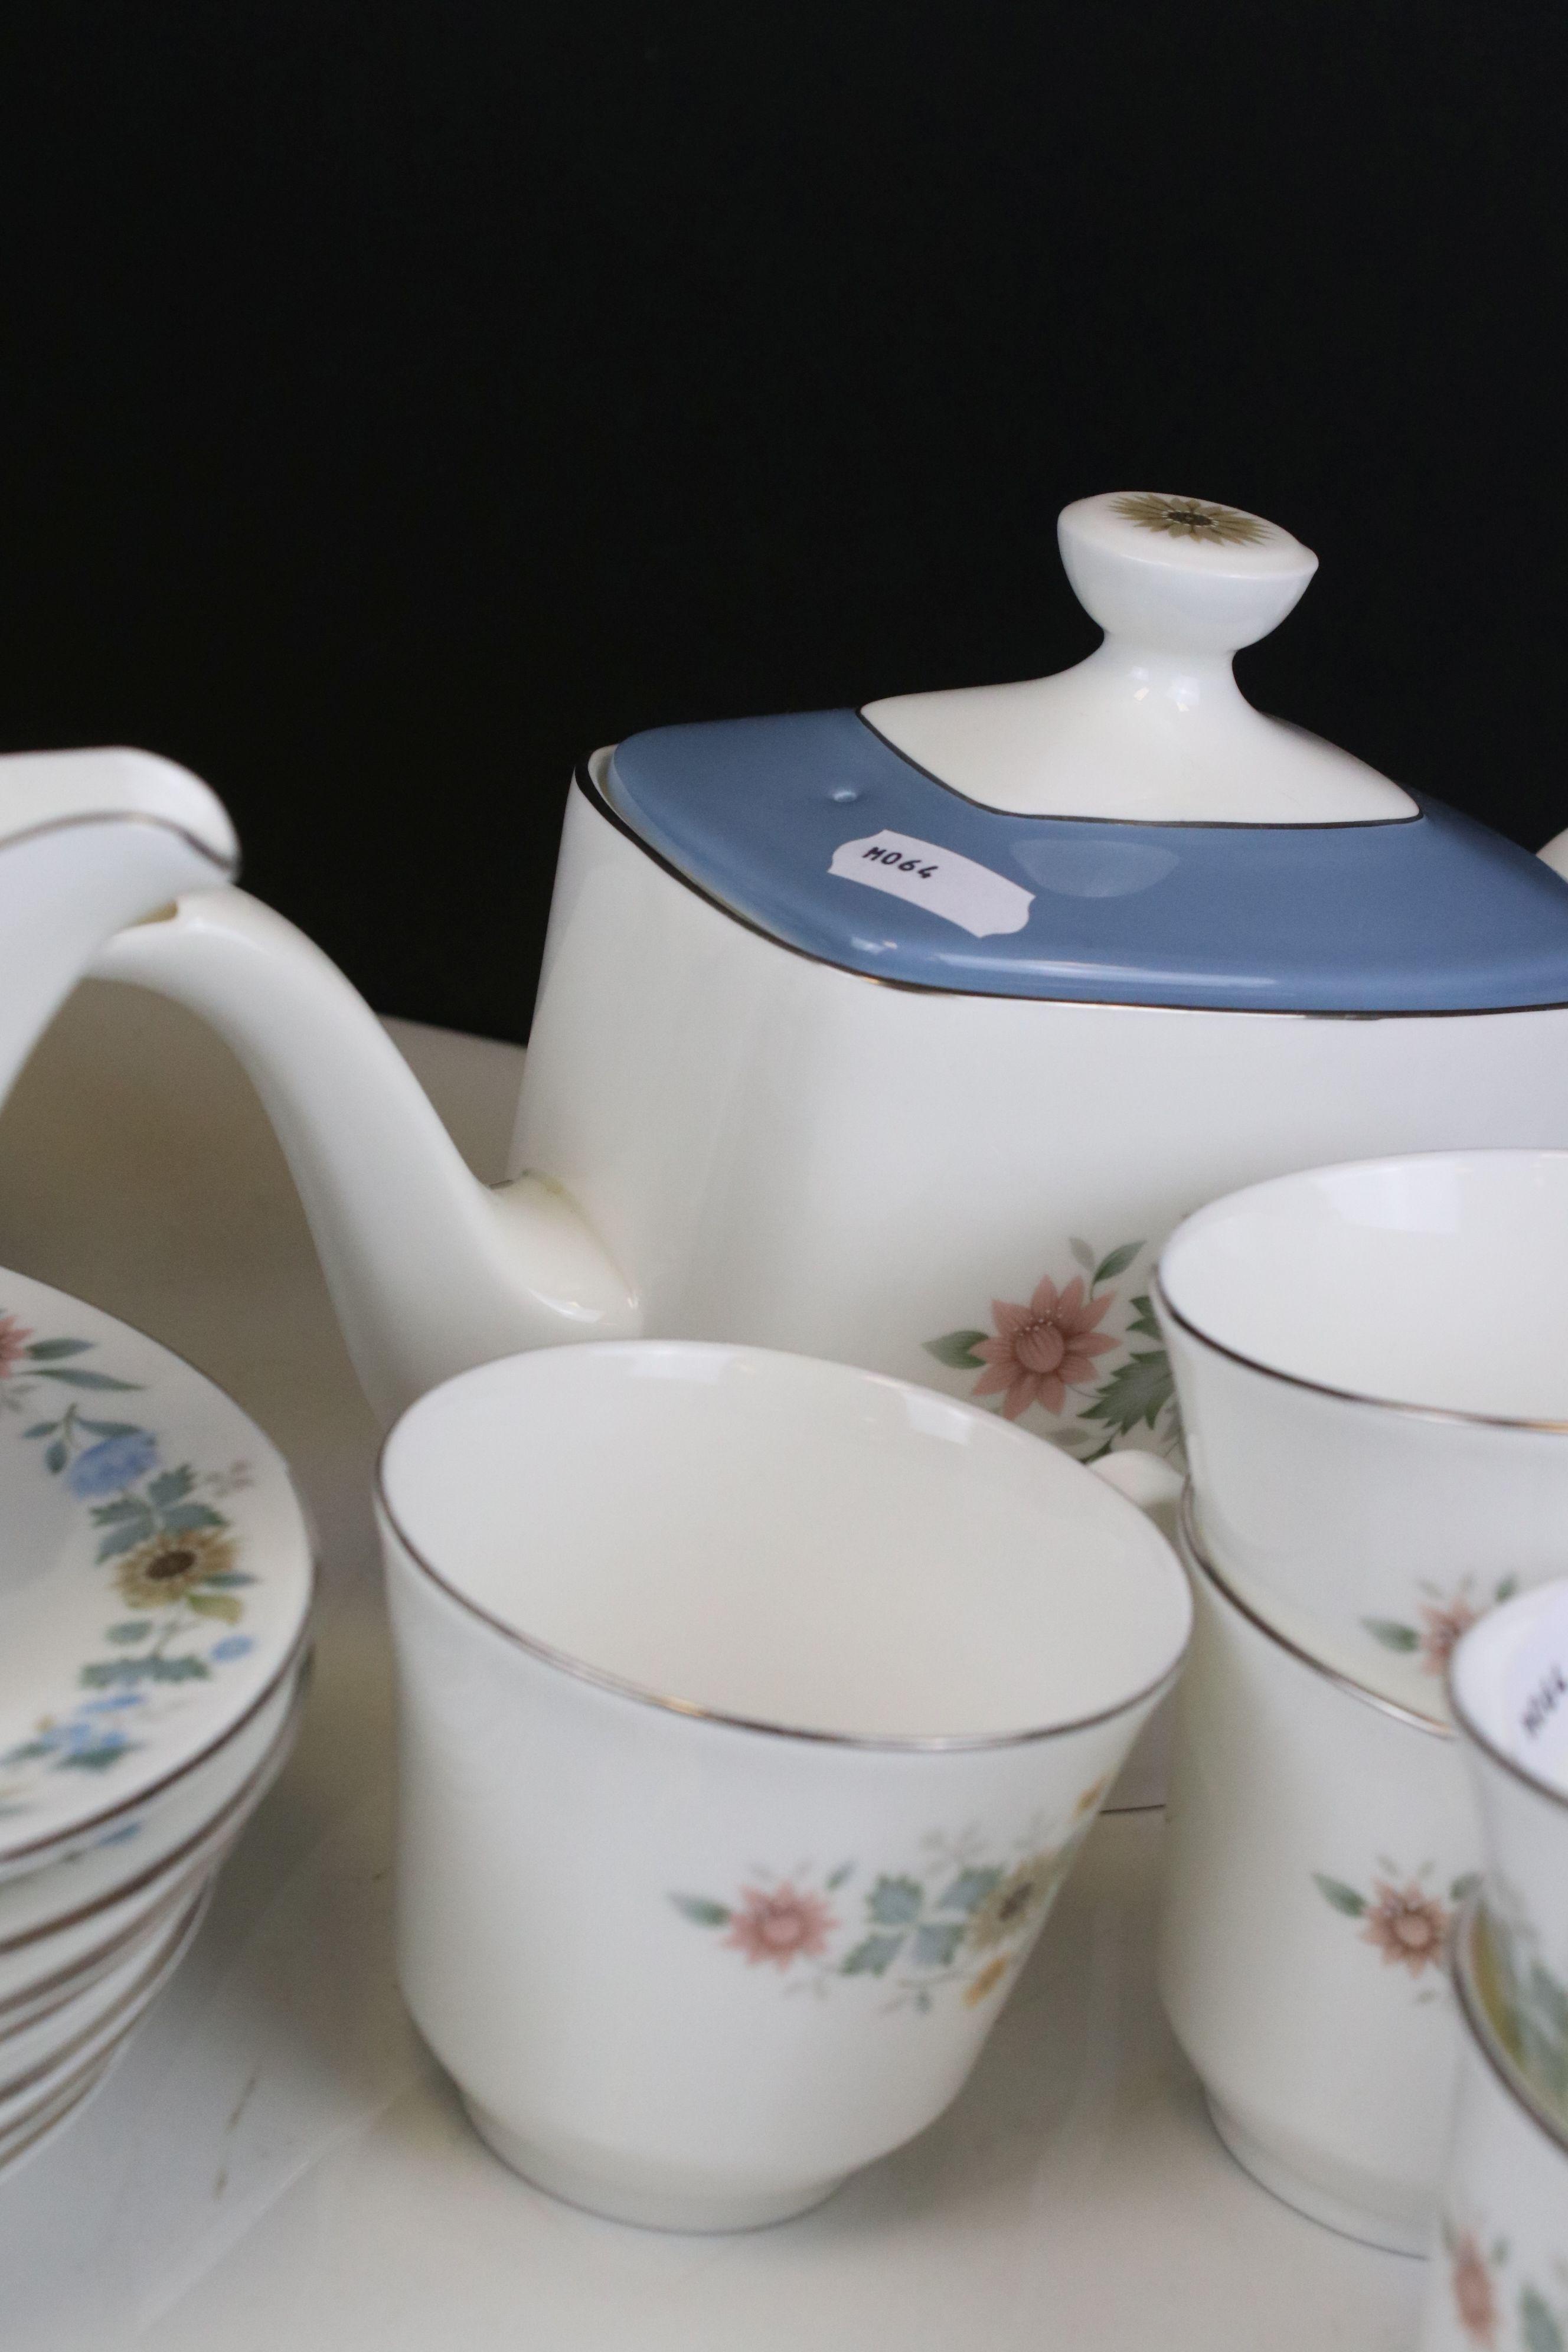 Royal Doulton ' Pastorale ' Tea Set comprising Two Teapots, Milk, Sugar, 6 Cups and 7 Saucers - Image 5 of 7